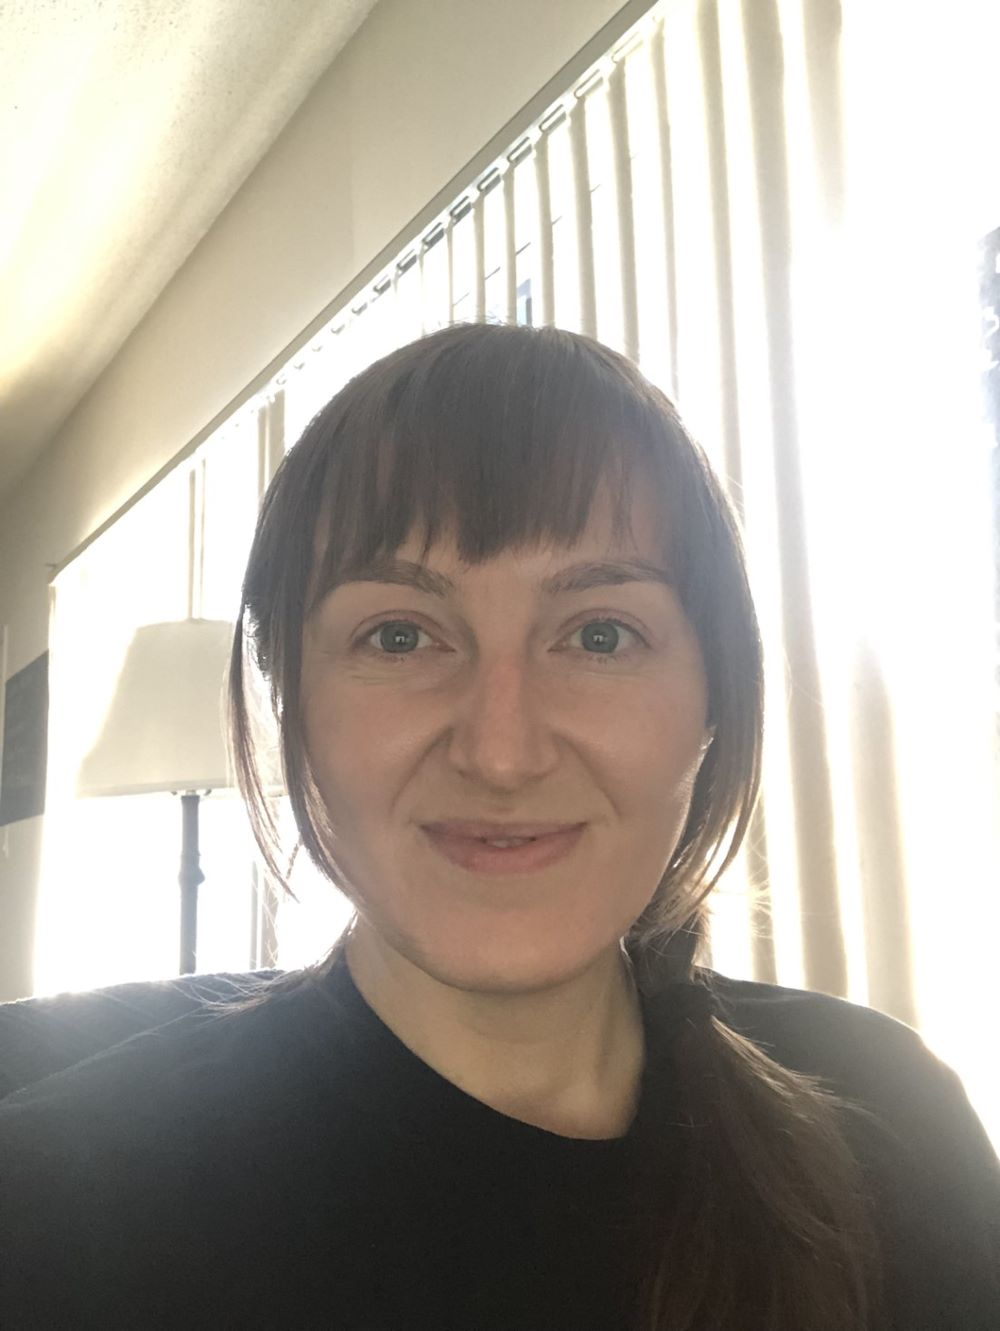 KathleenWisneski_Headshot_081721 BOOM! Studios announces 2021 promotions and new hires